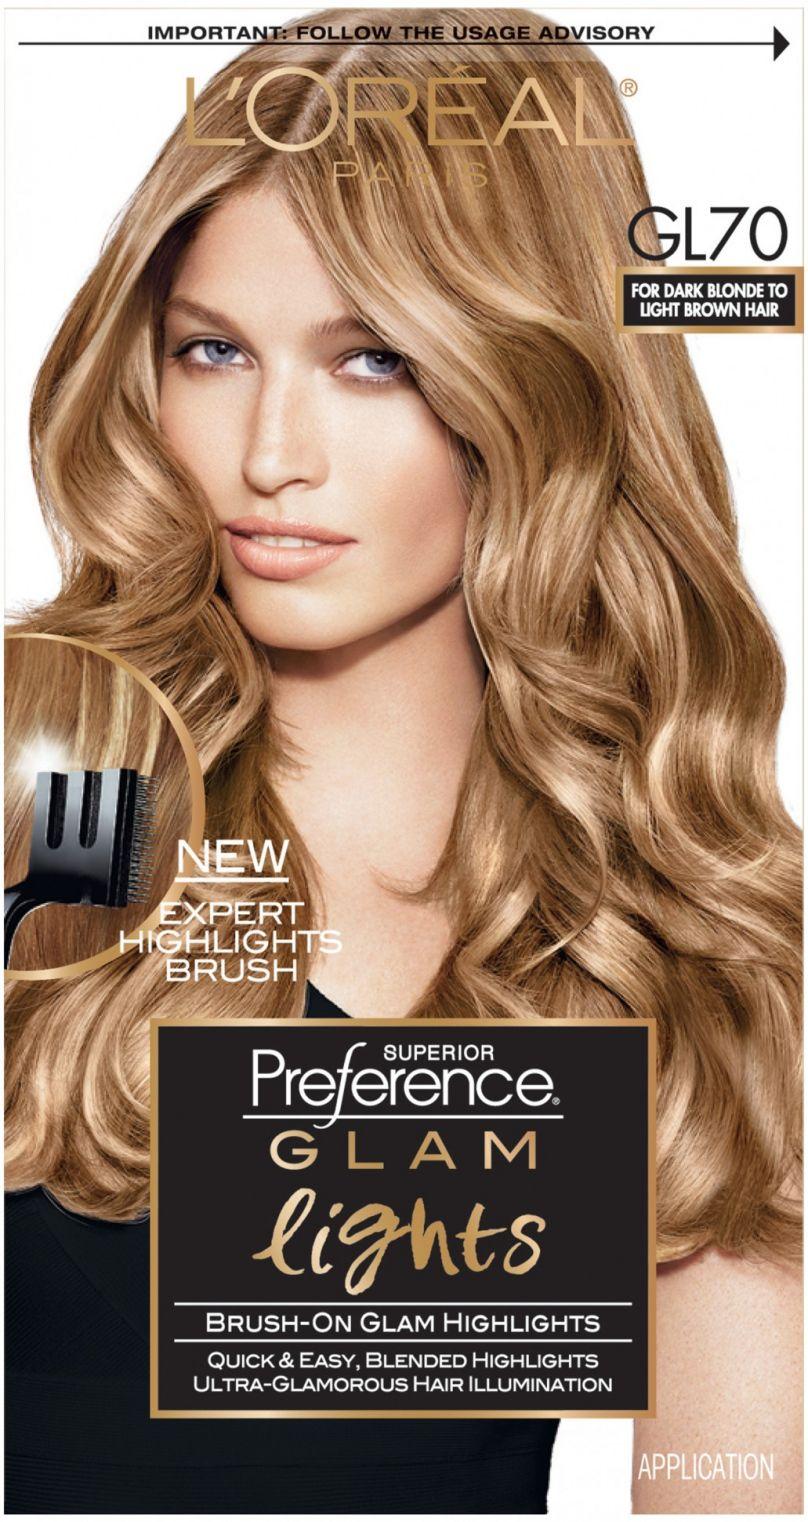 Best Dark Blonde Hair Color Home Best Safe Hair Color Check More At Http Www Fitnursetaylor Com Best Dark Hair Color Brands Boxed Hair Color Best Hair Dye